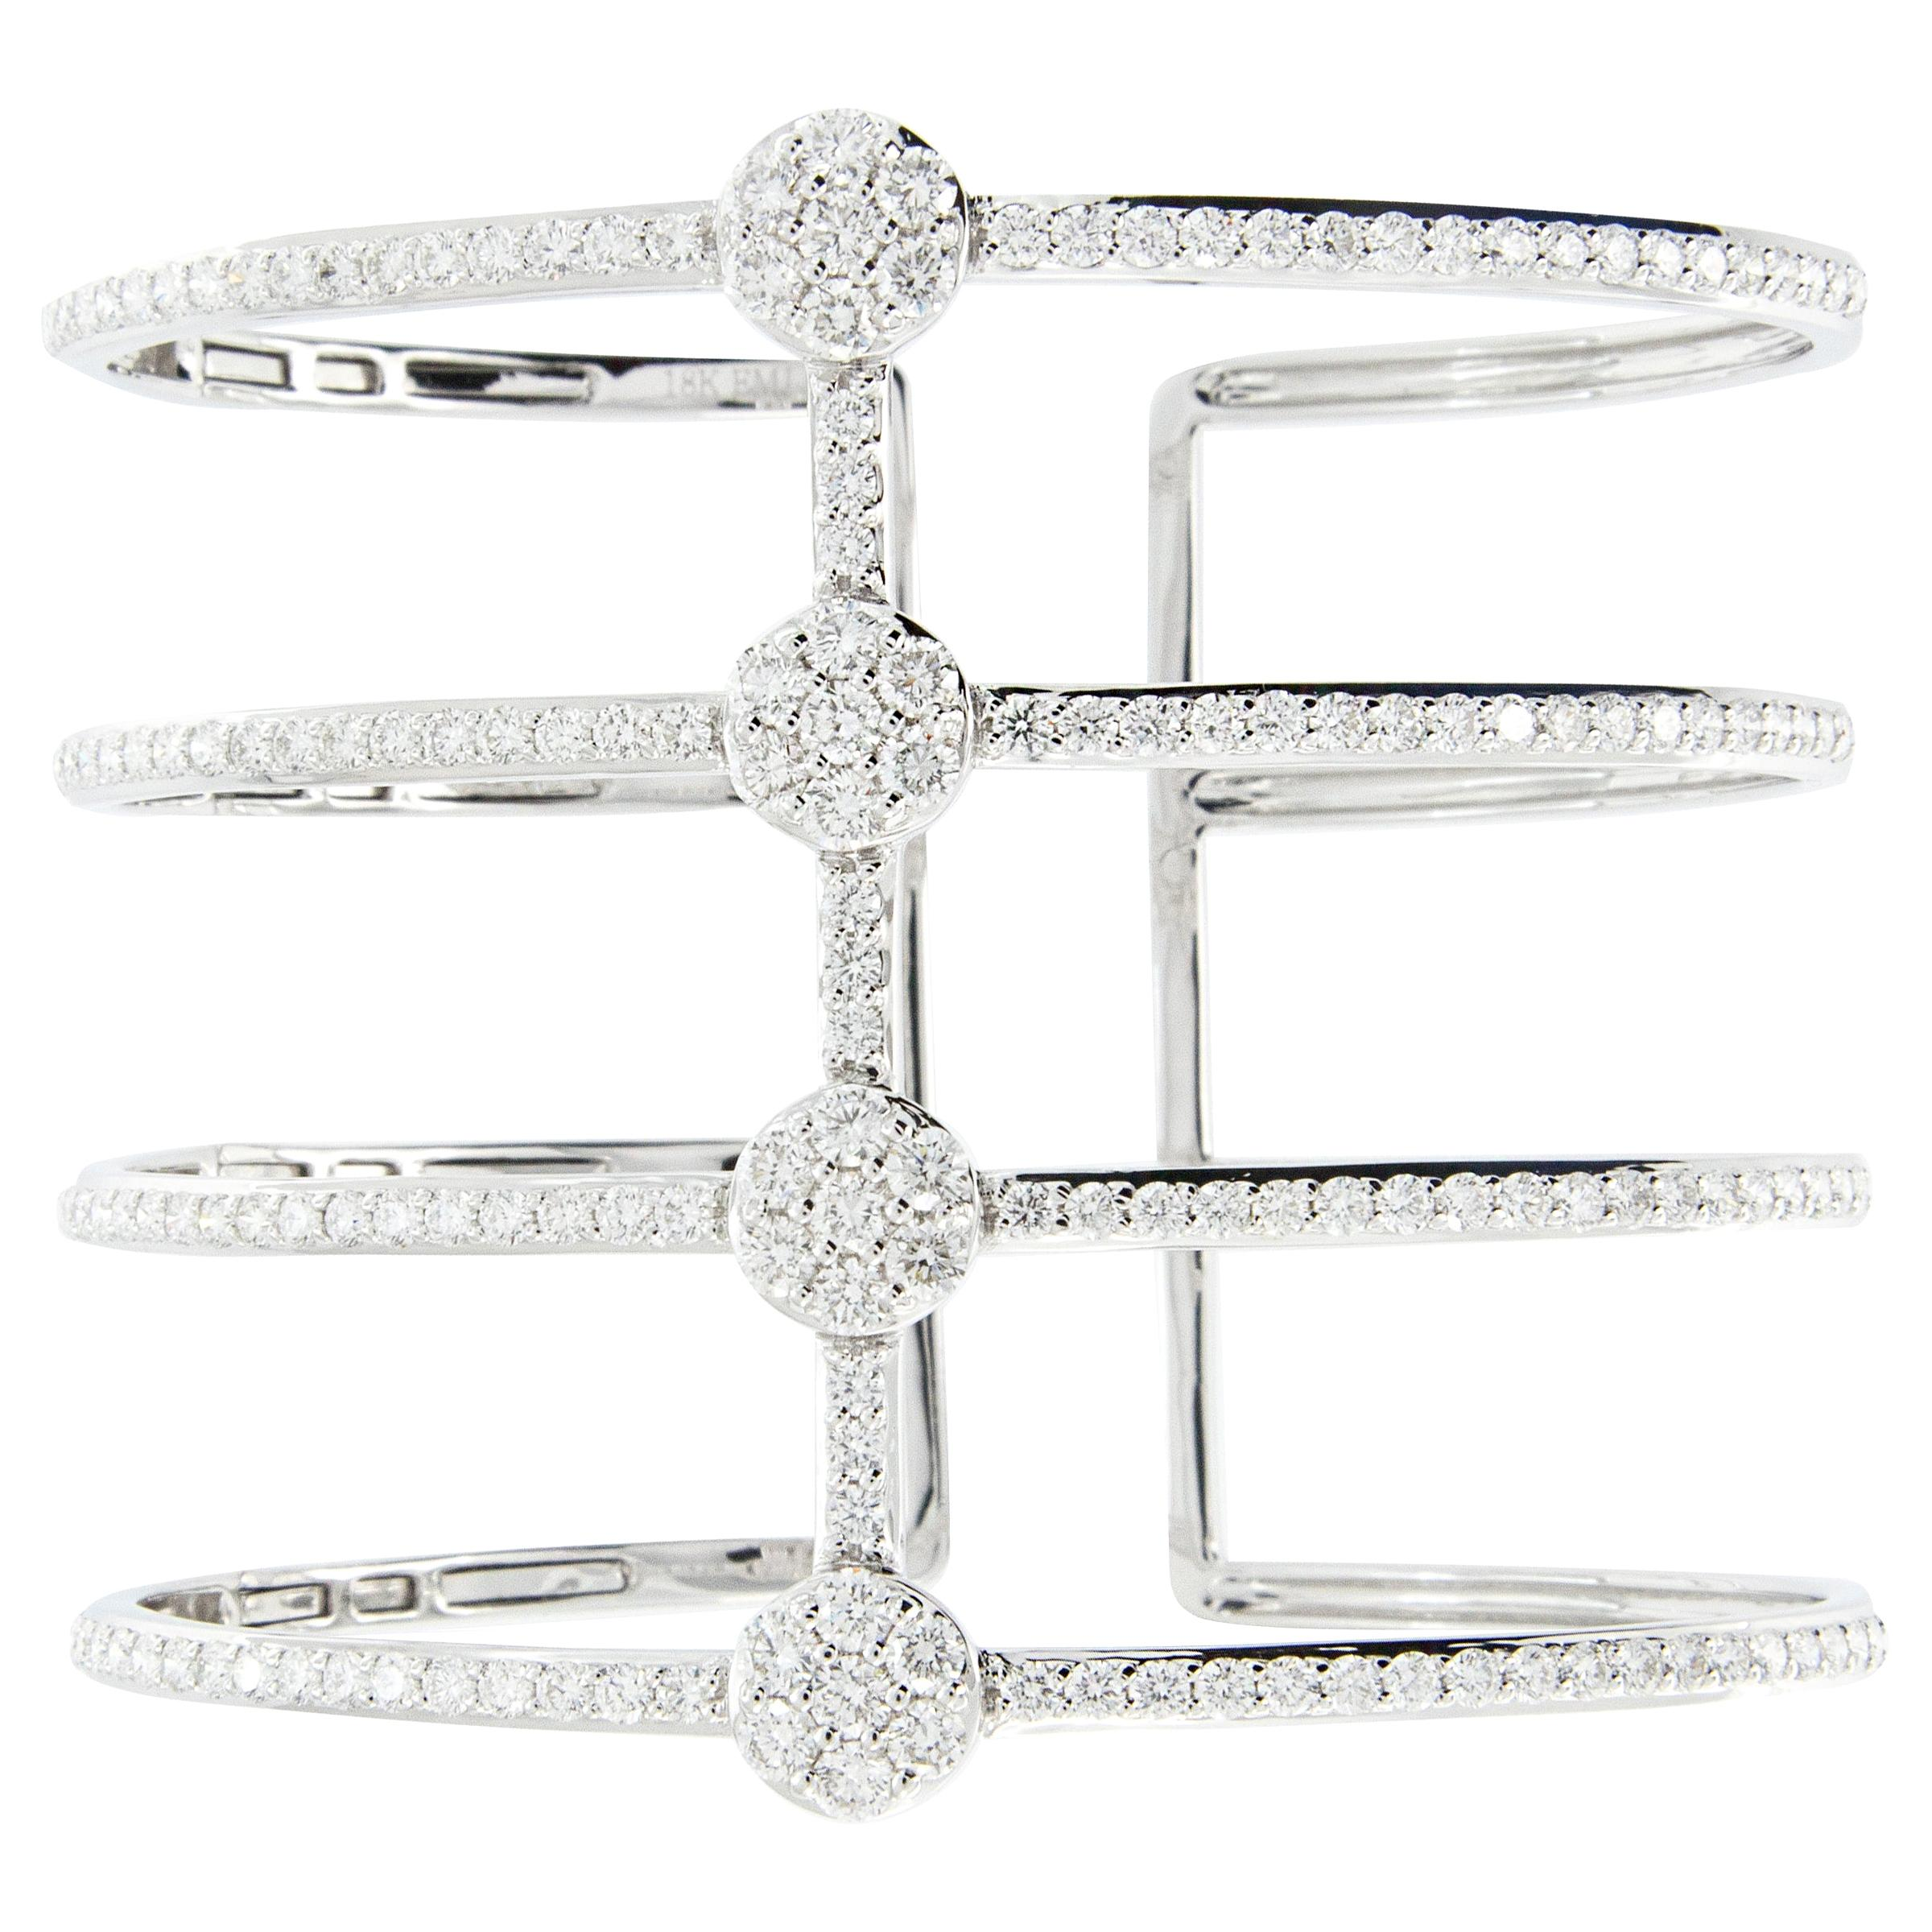 18 Karat Gold and Diamond Wide Cuff Bracelet